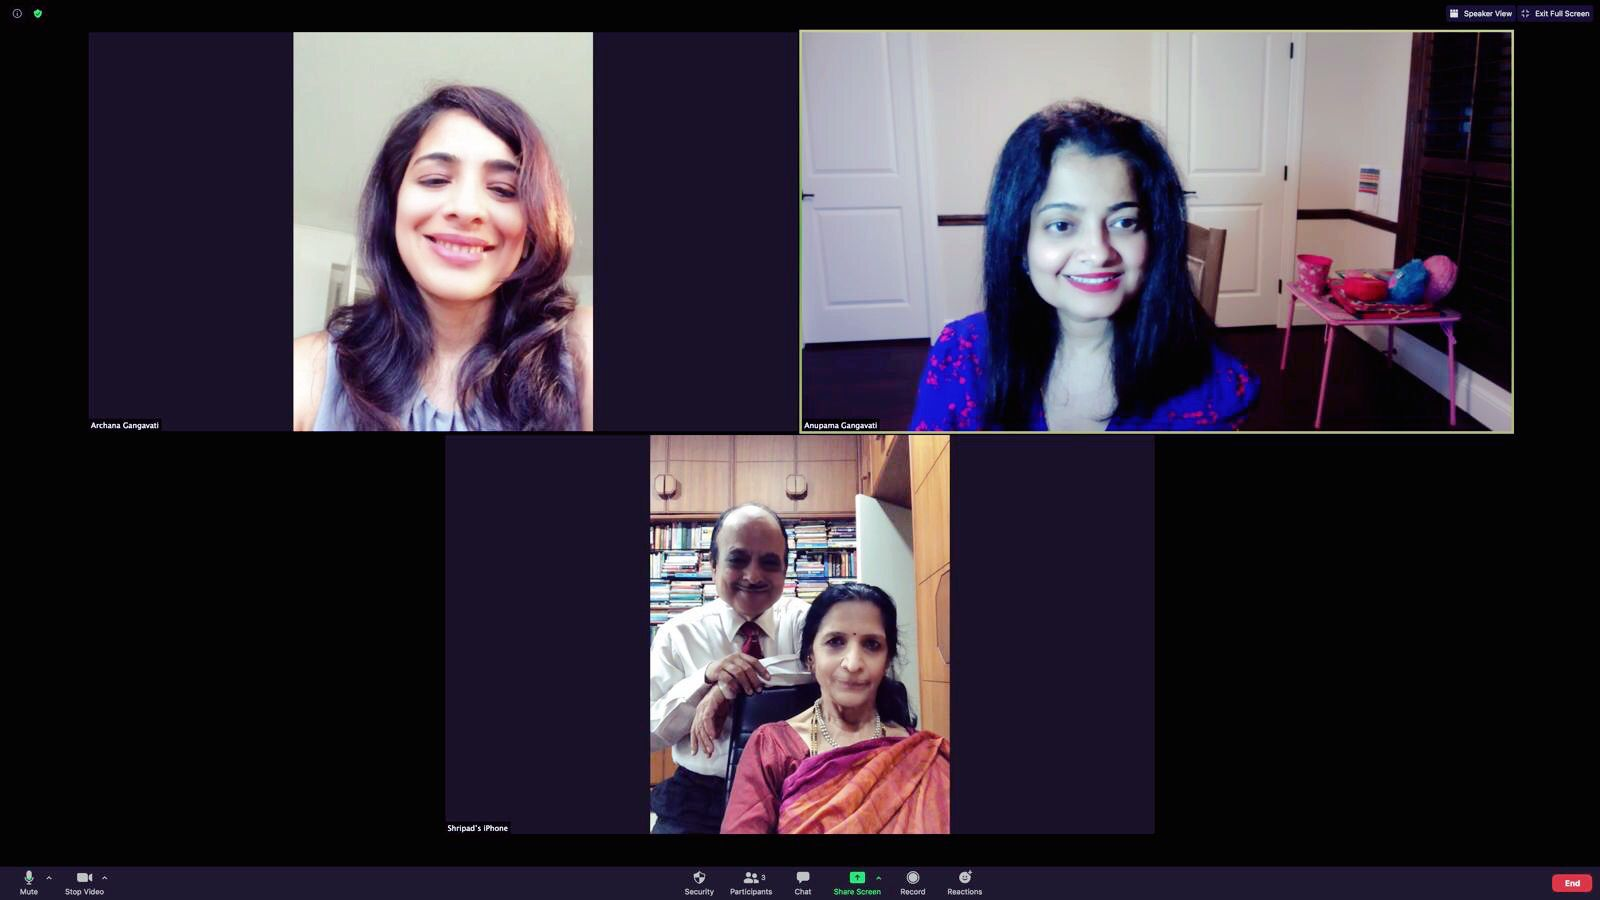 Sisters Archana Gangavati (top left) and Dr. Anupama Gangavati (top right) keep tabs on parents Shripad (standing) and Parimala Gangavati in India through Zoom and WhatsApp.